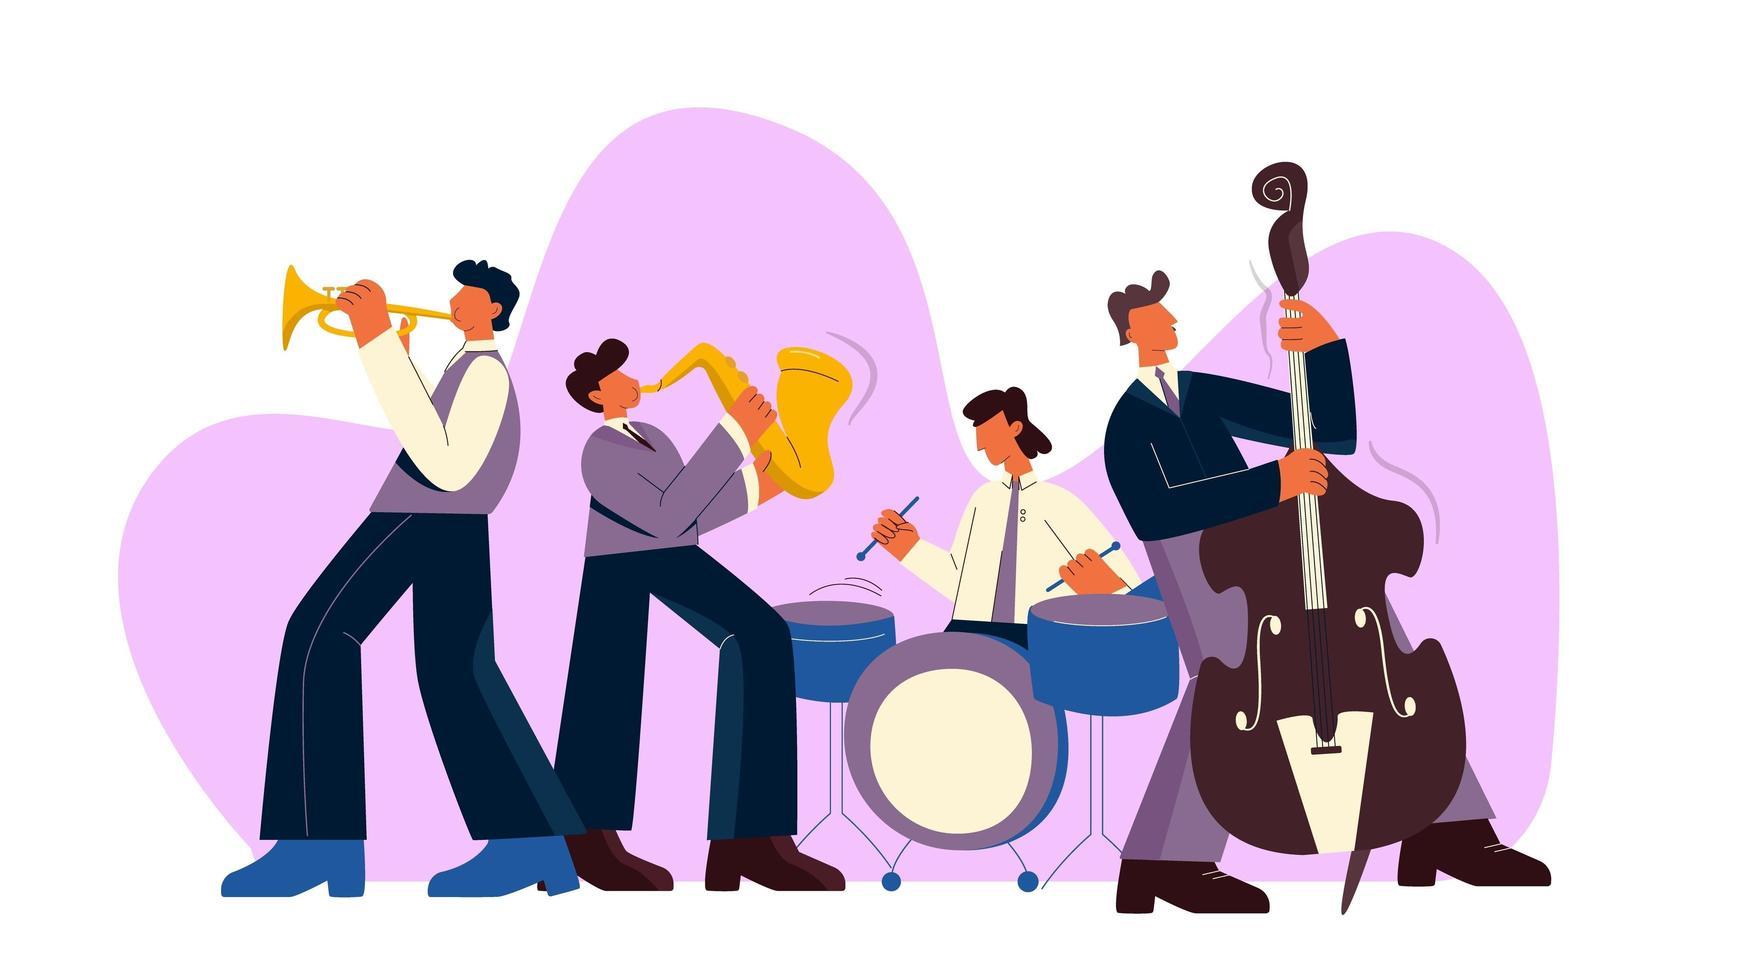 Jazz band playing music  vector